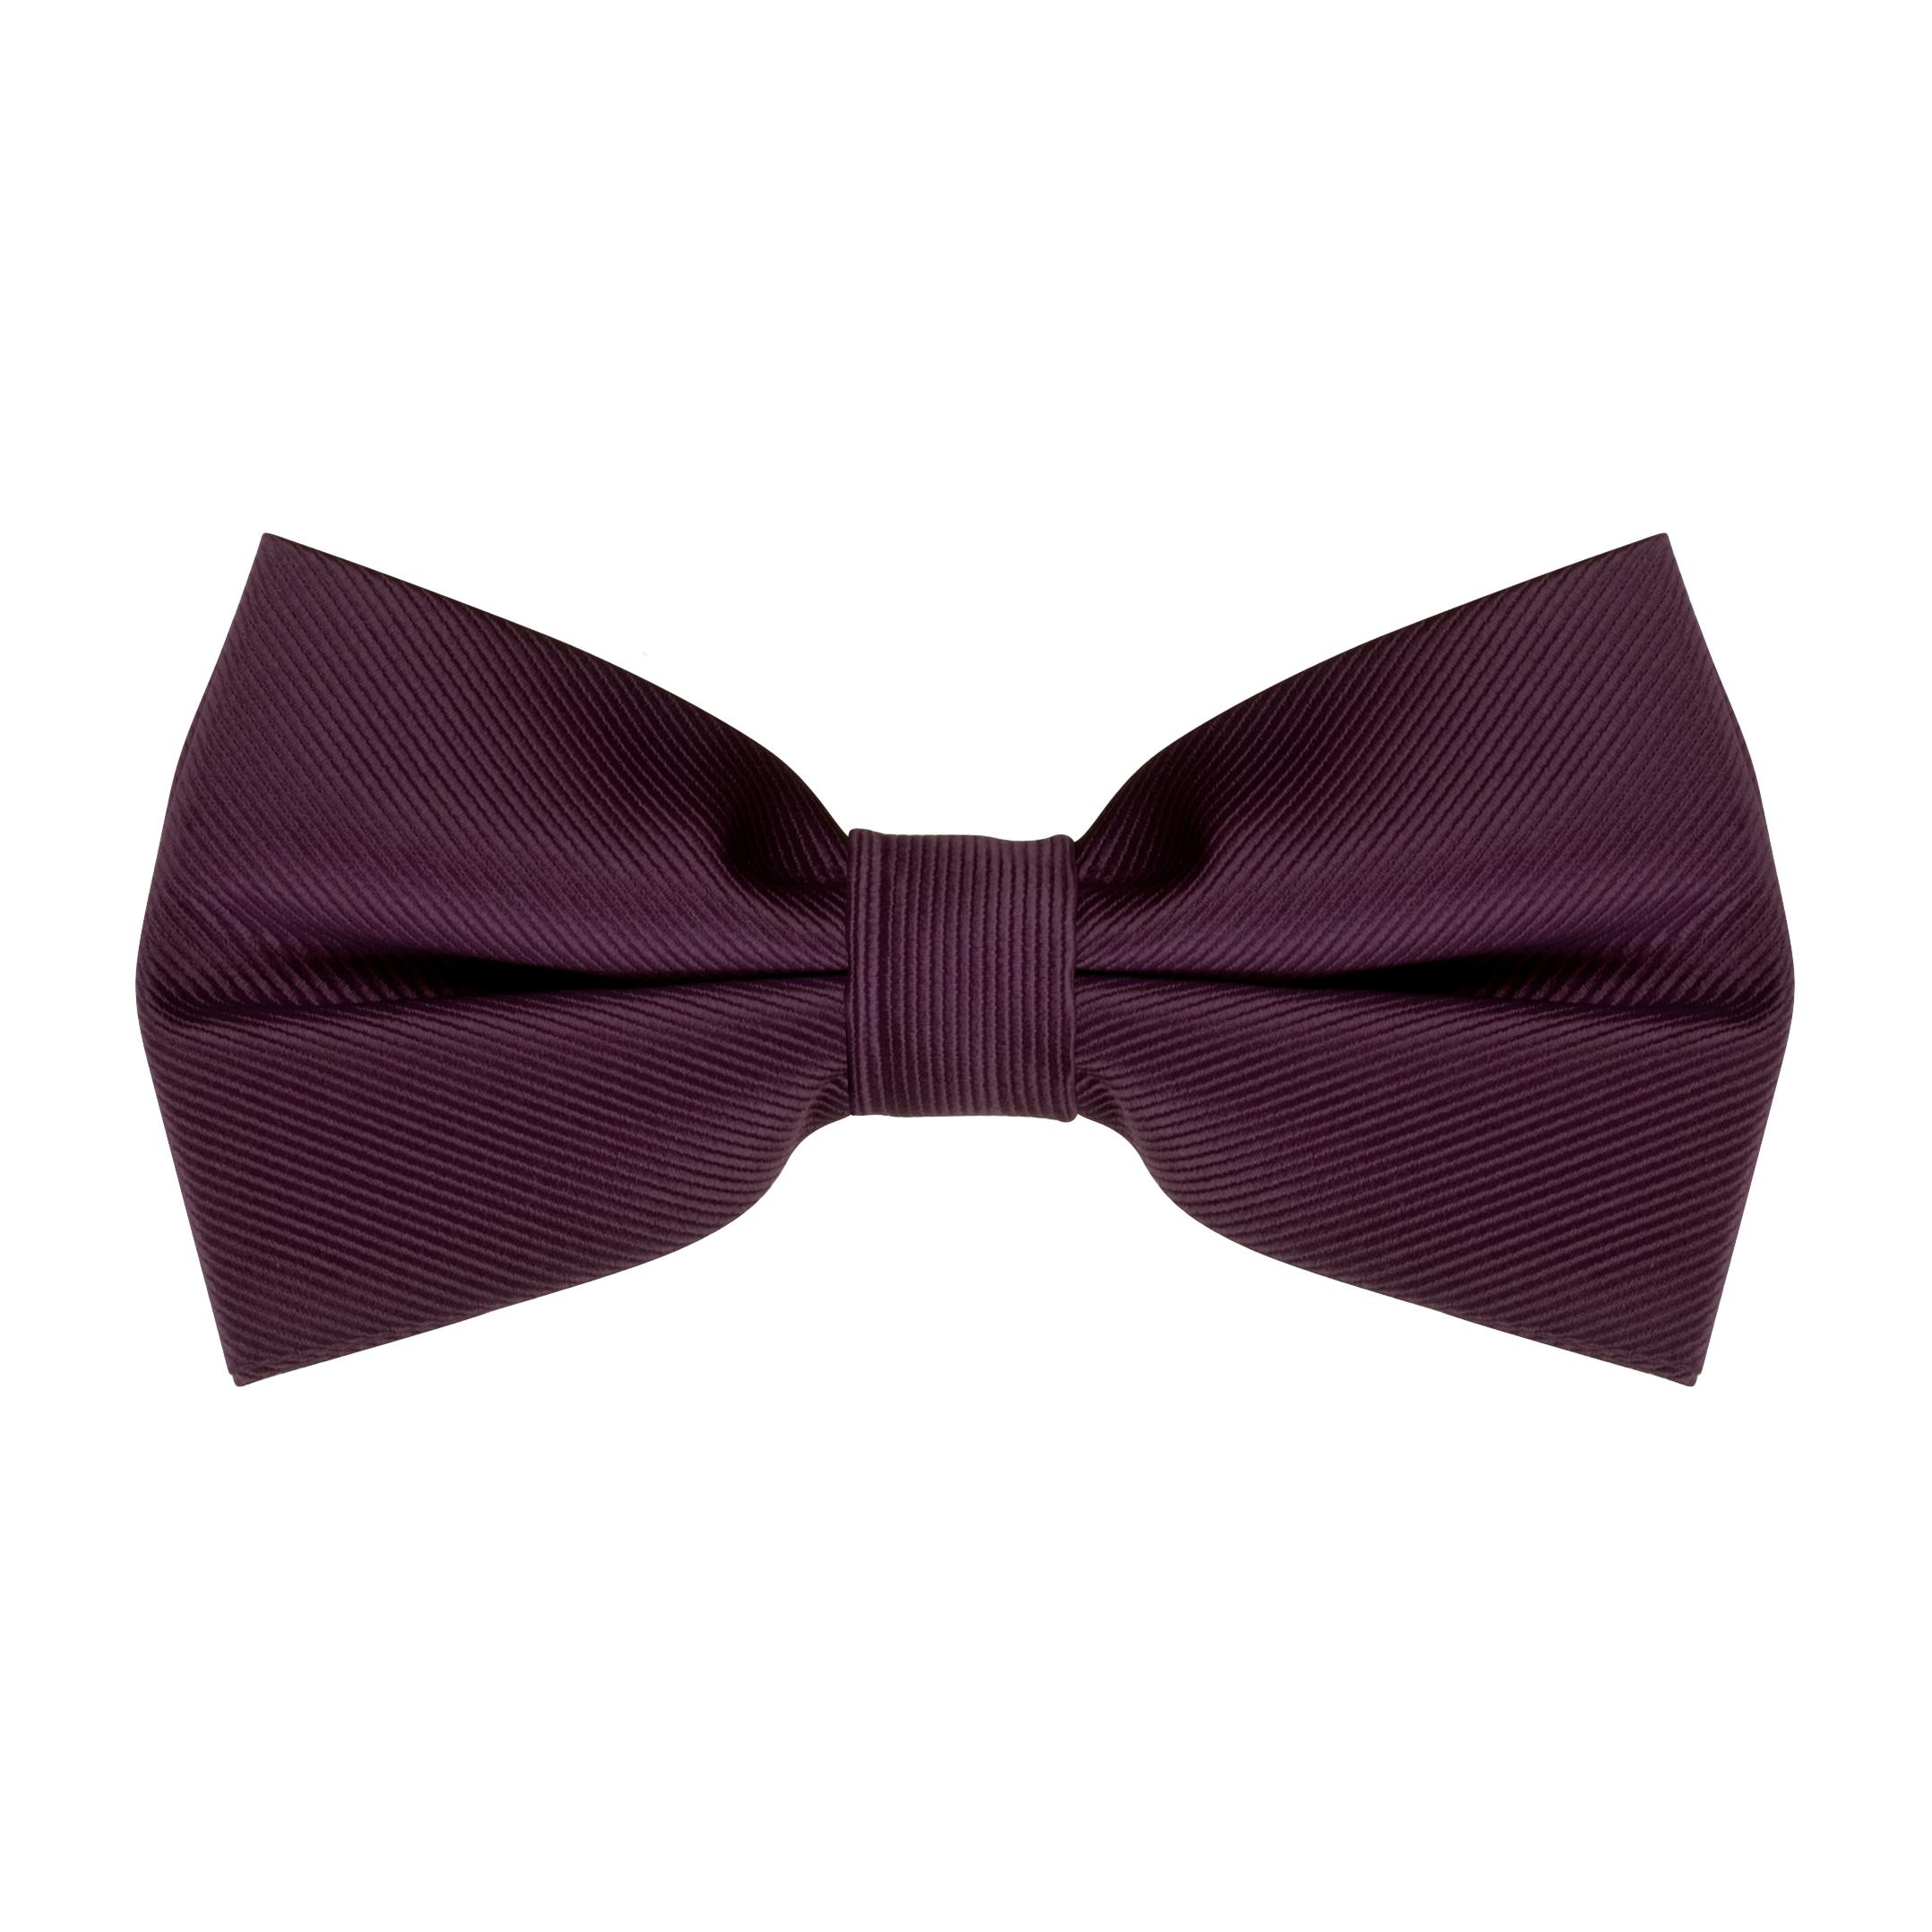 Bow Tie in Eggplant